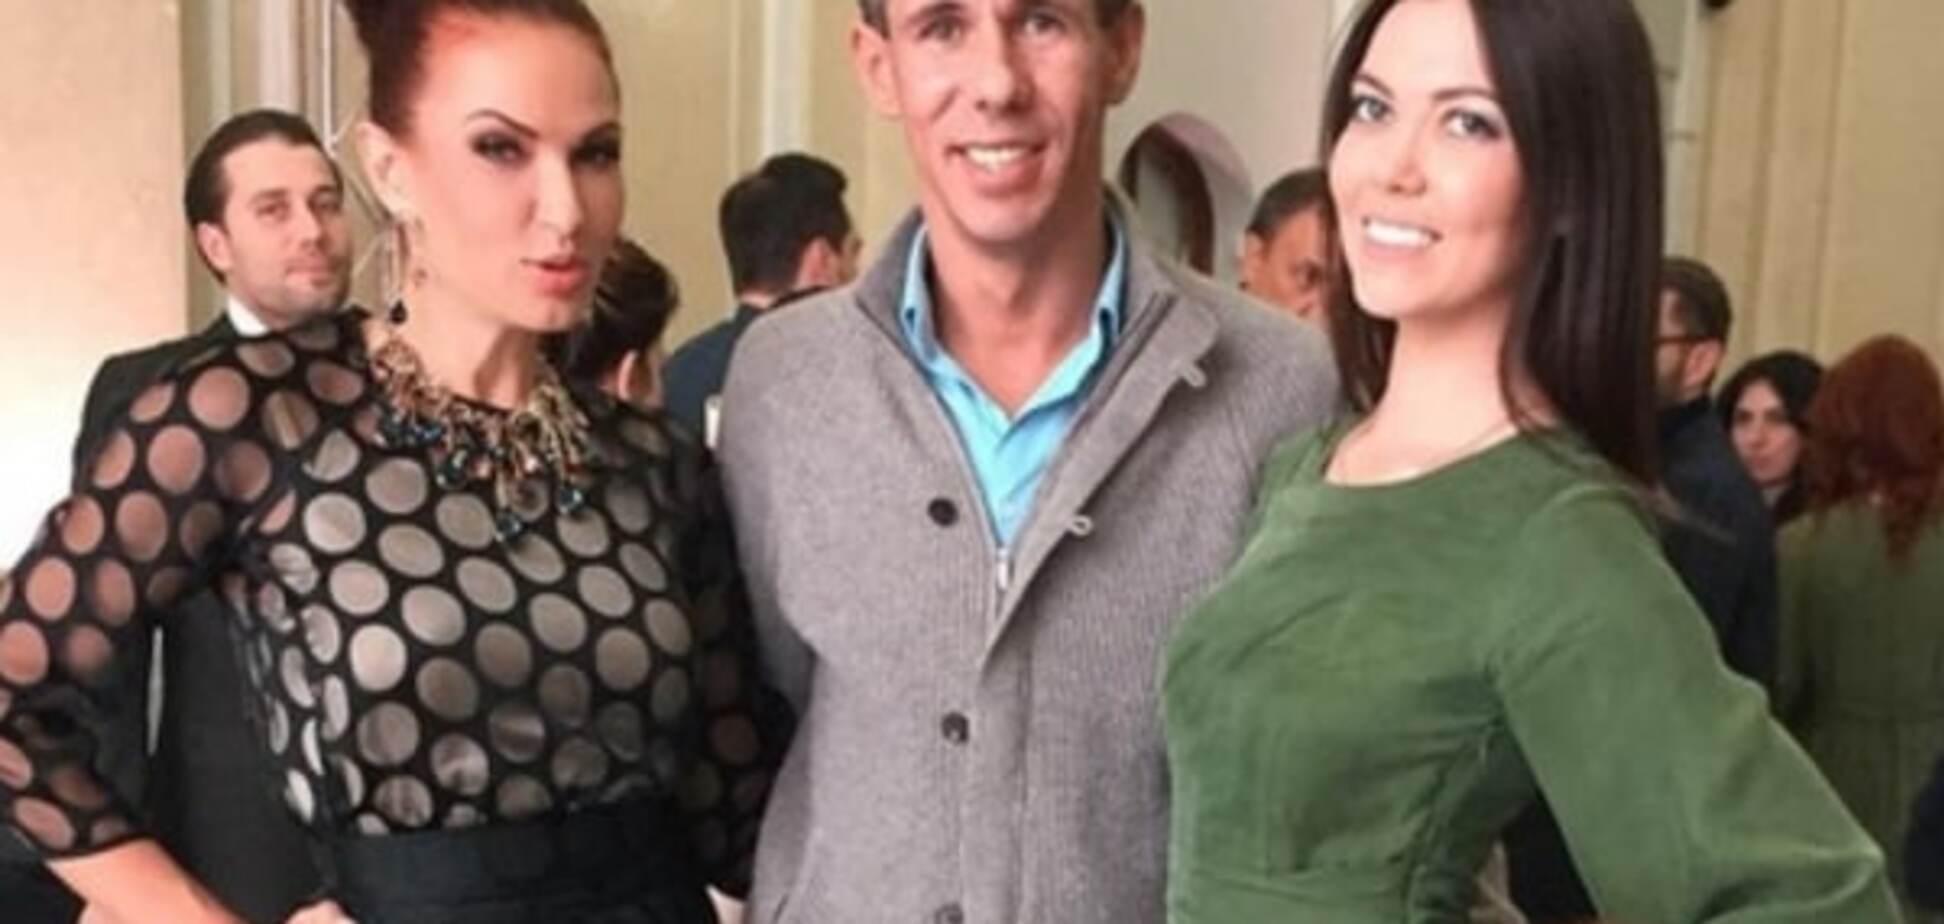 Актер Панин после выписки из 'психушки' нашел невесту